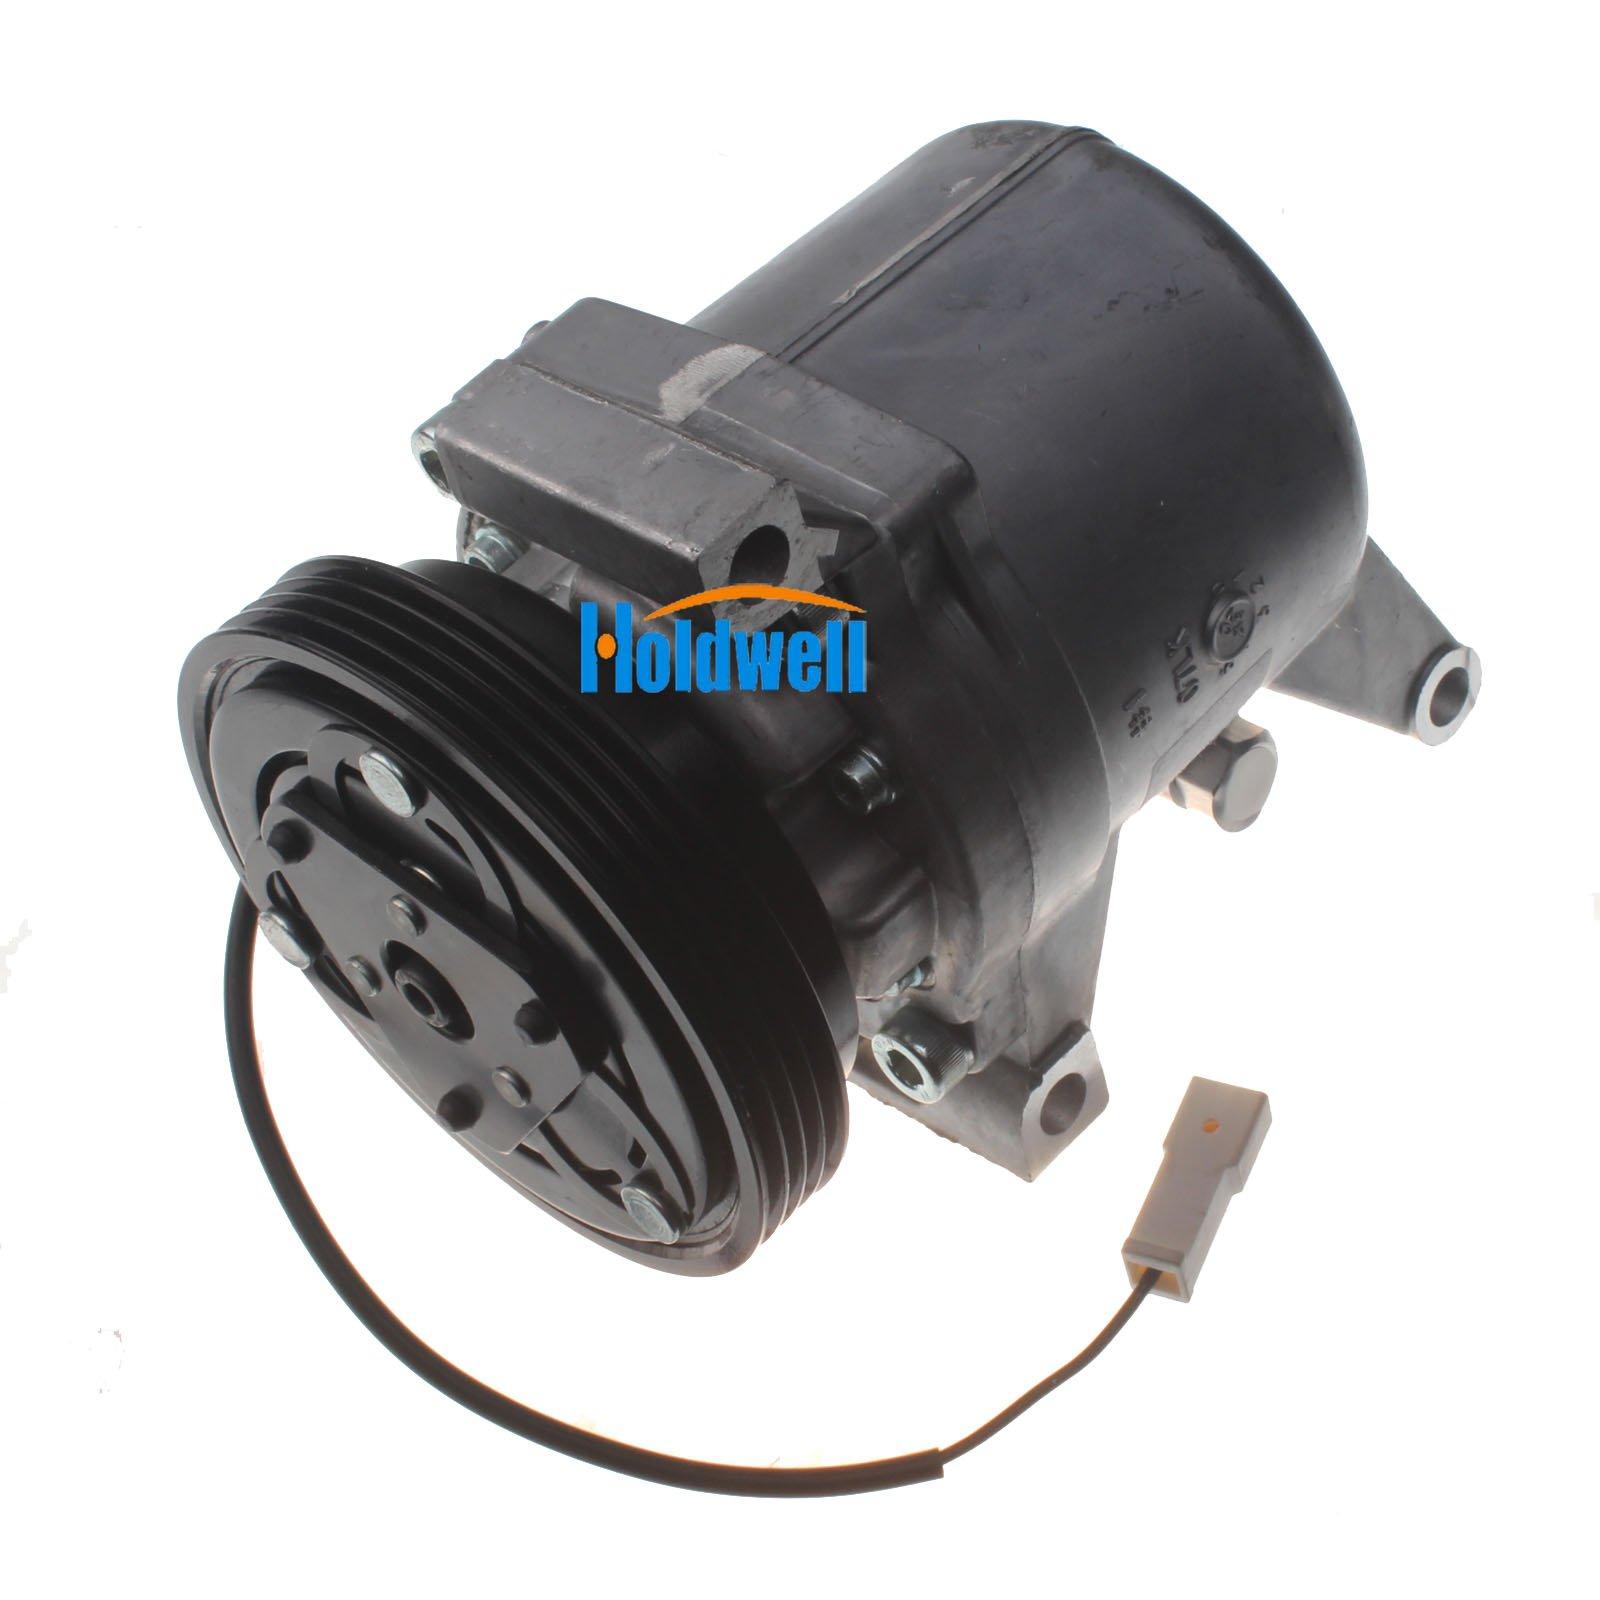 Holdwell Auto AC Compressor 95201-77GB2 9520177GB2 for Suzuki Jimny Seiko Seiki SS07LK10 by Holdwell (Image #8)